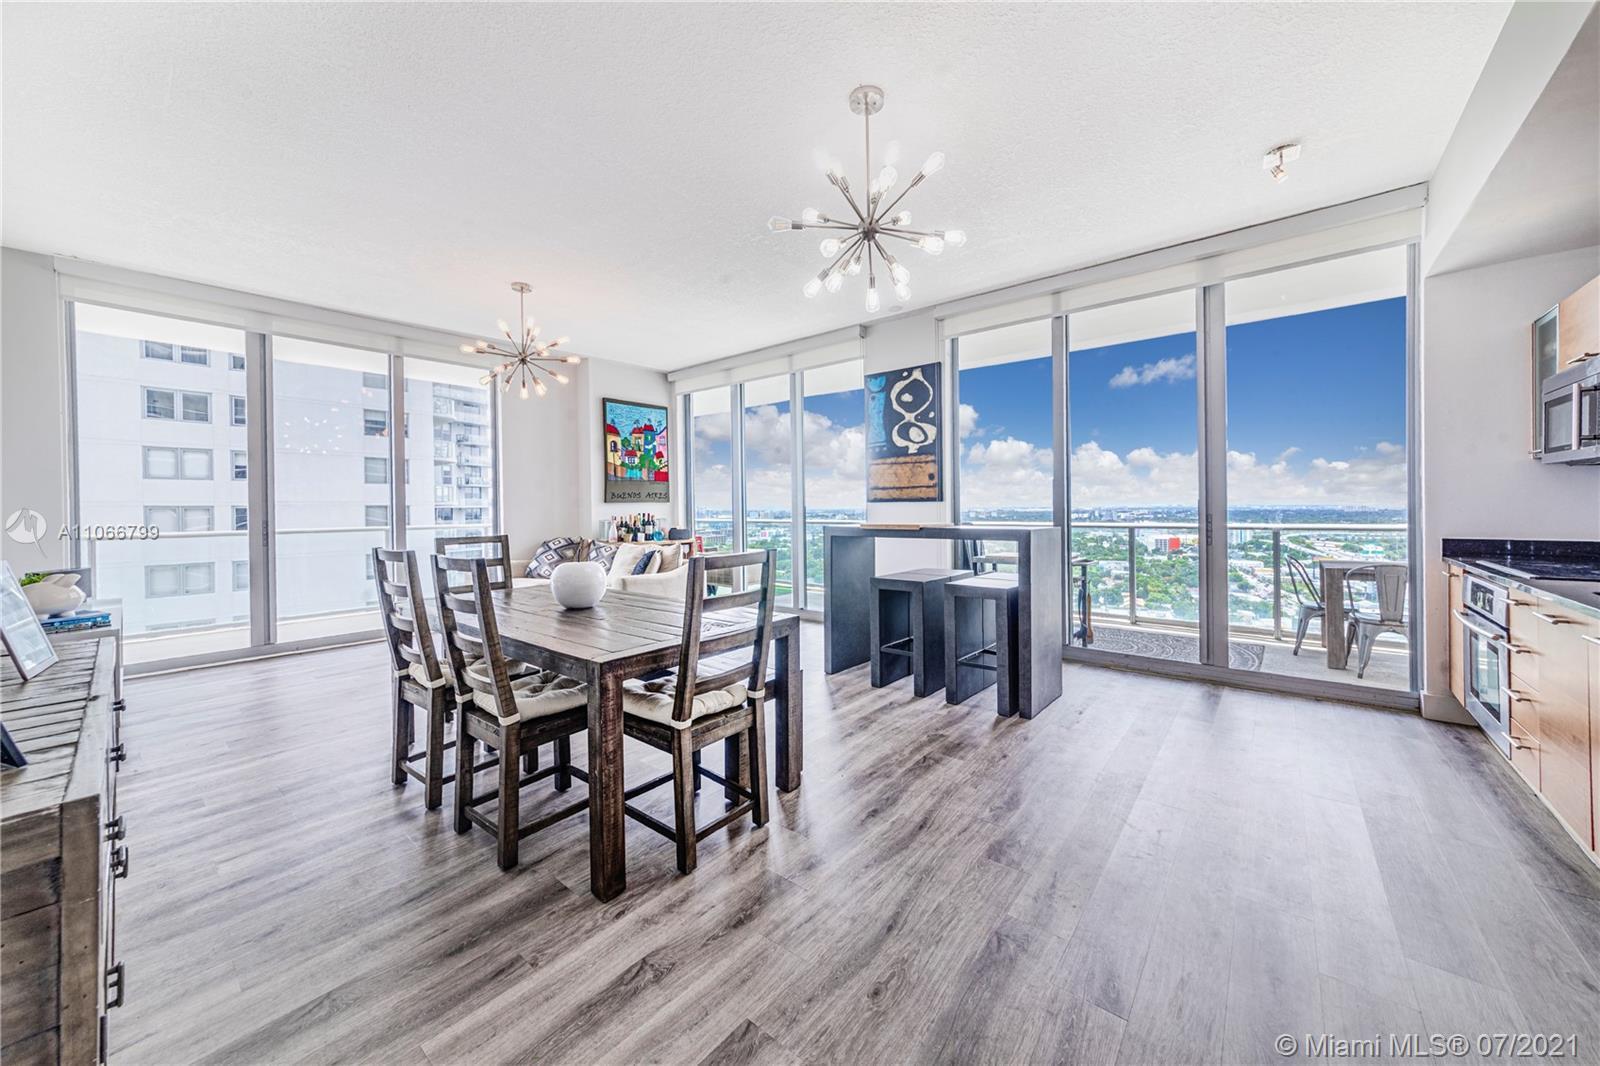 Stunning 2bd/2ba corner unit with breathtaking City & Bay views in prestigious Midtown Miami. Open f